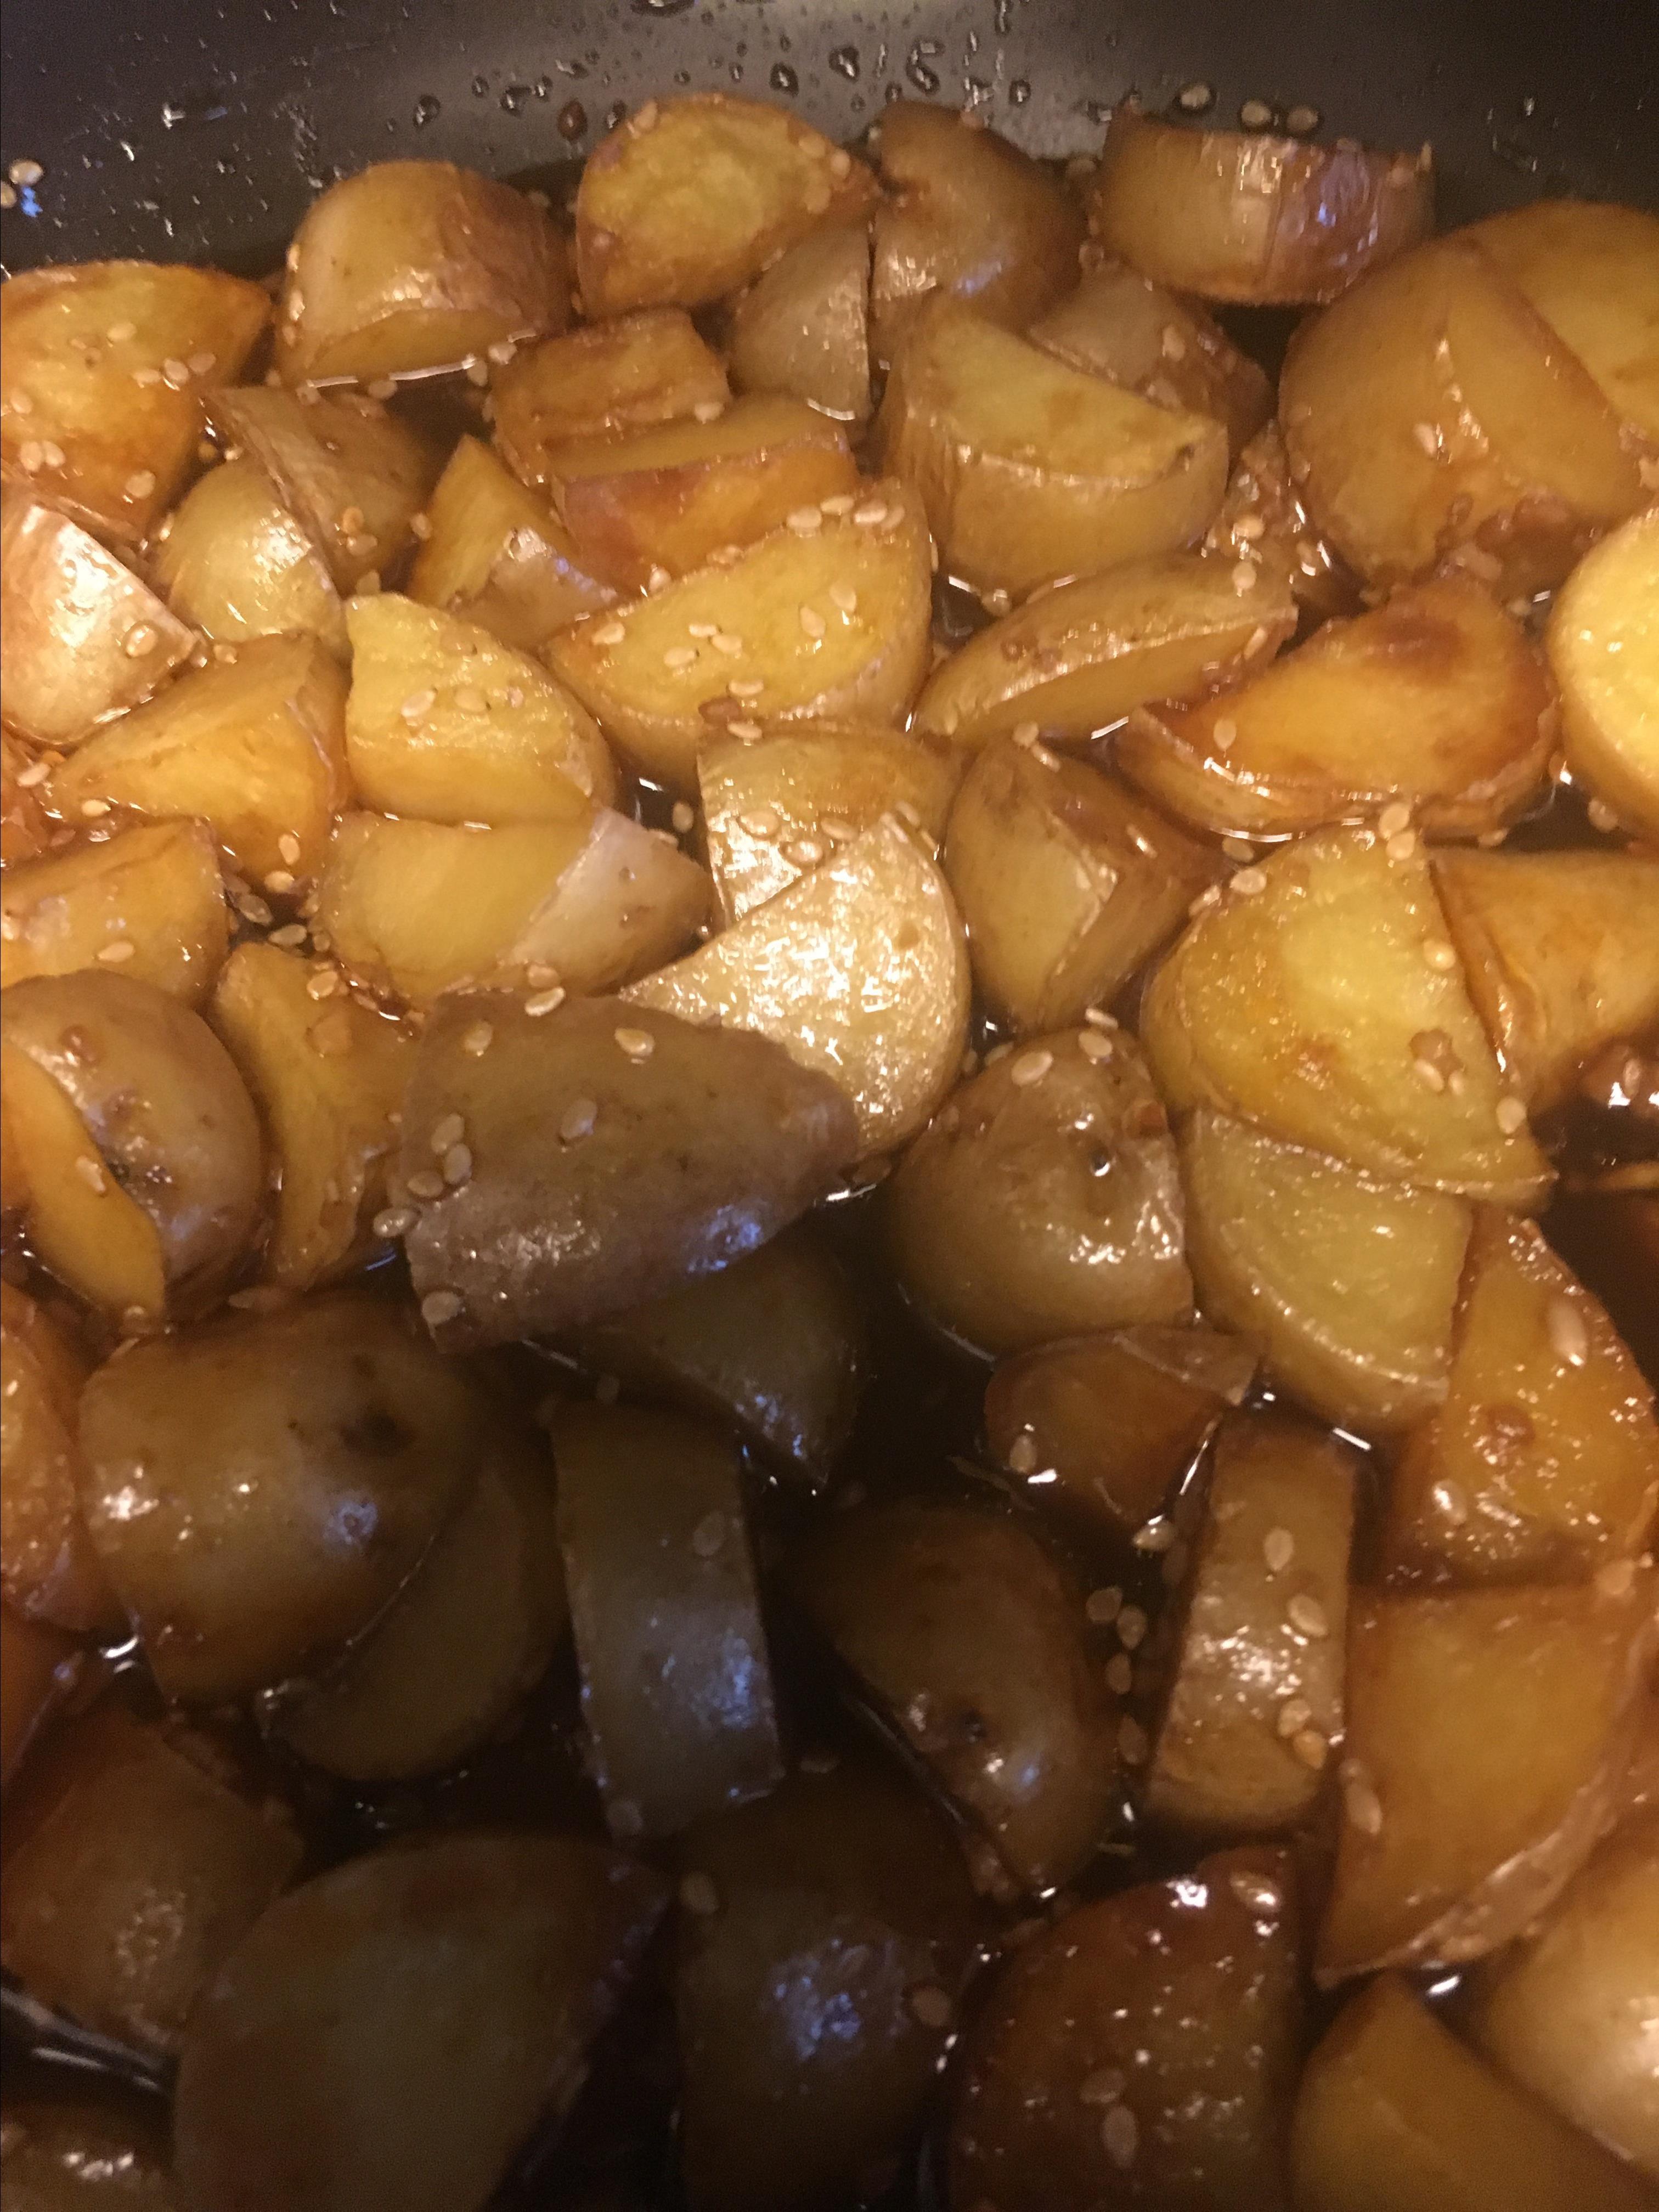 Korean Potatoes Ihatedoggo